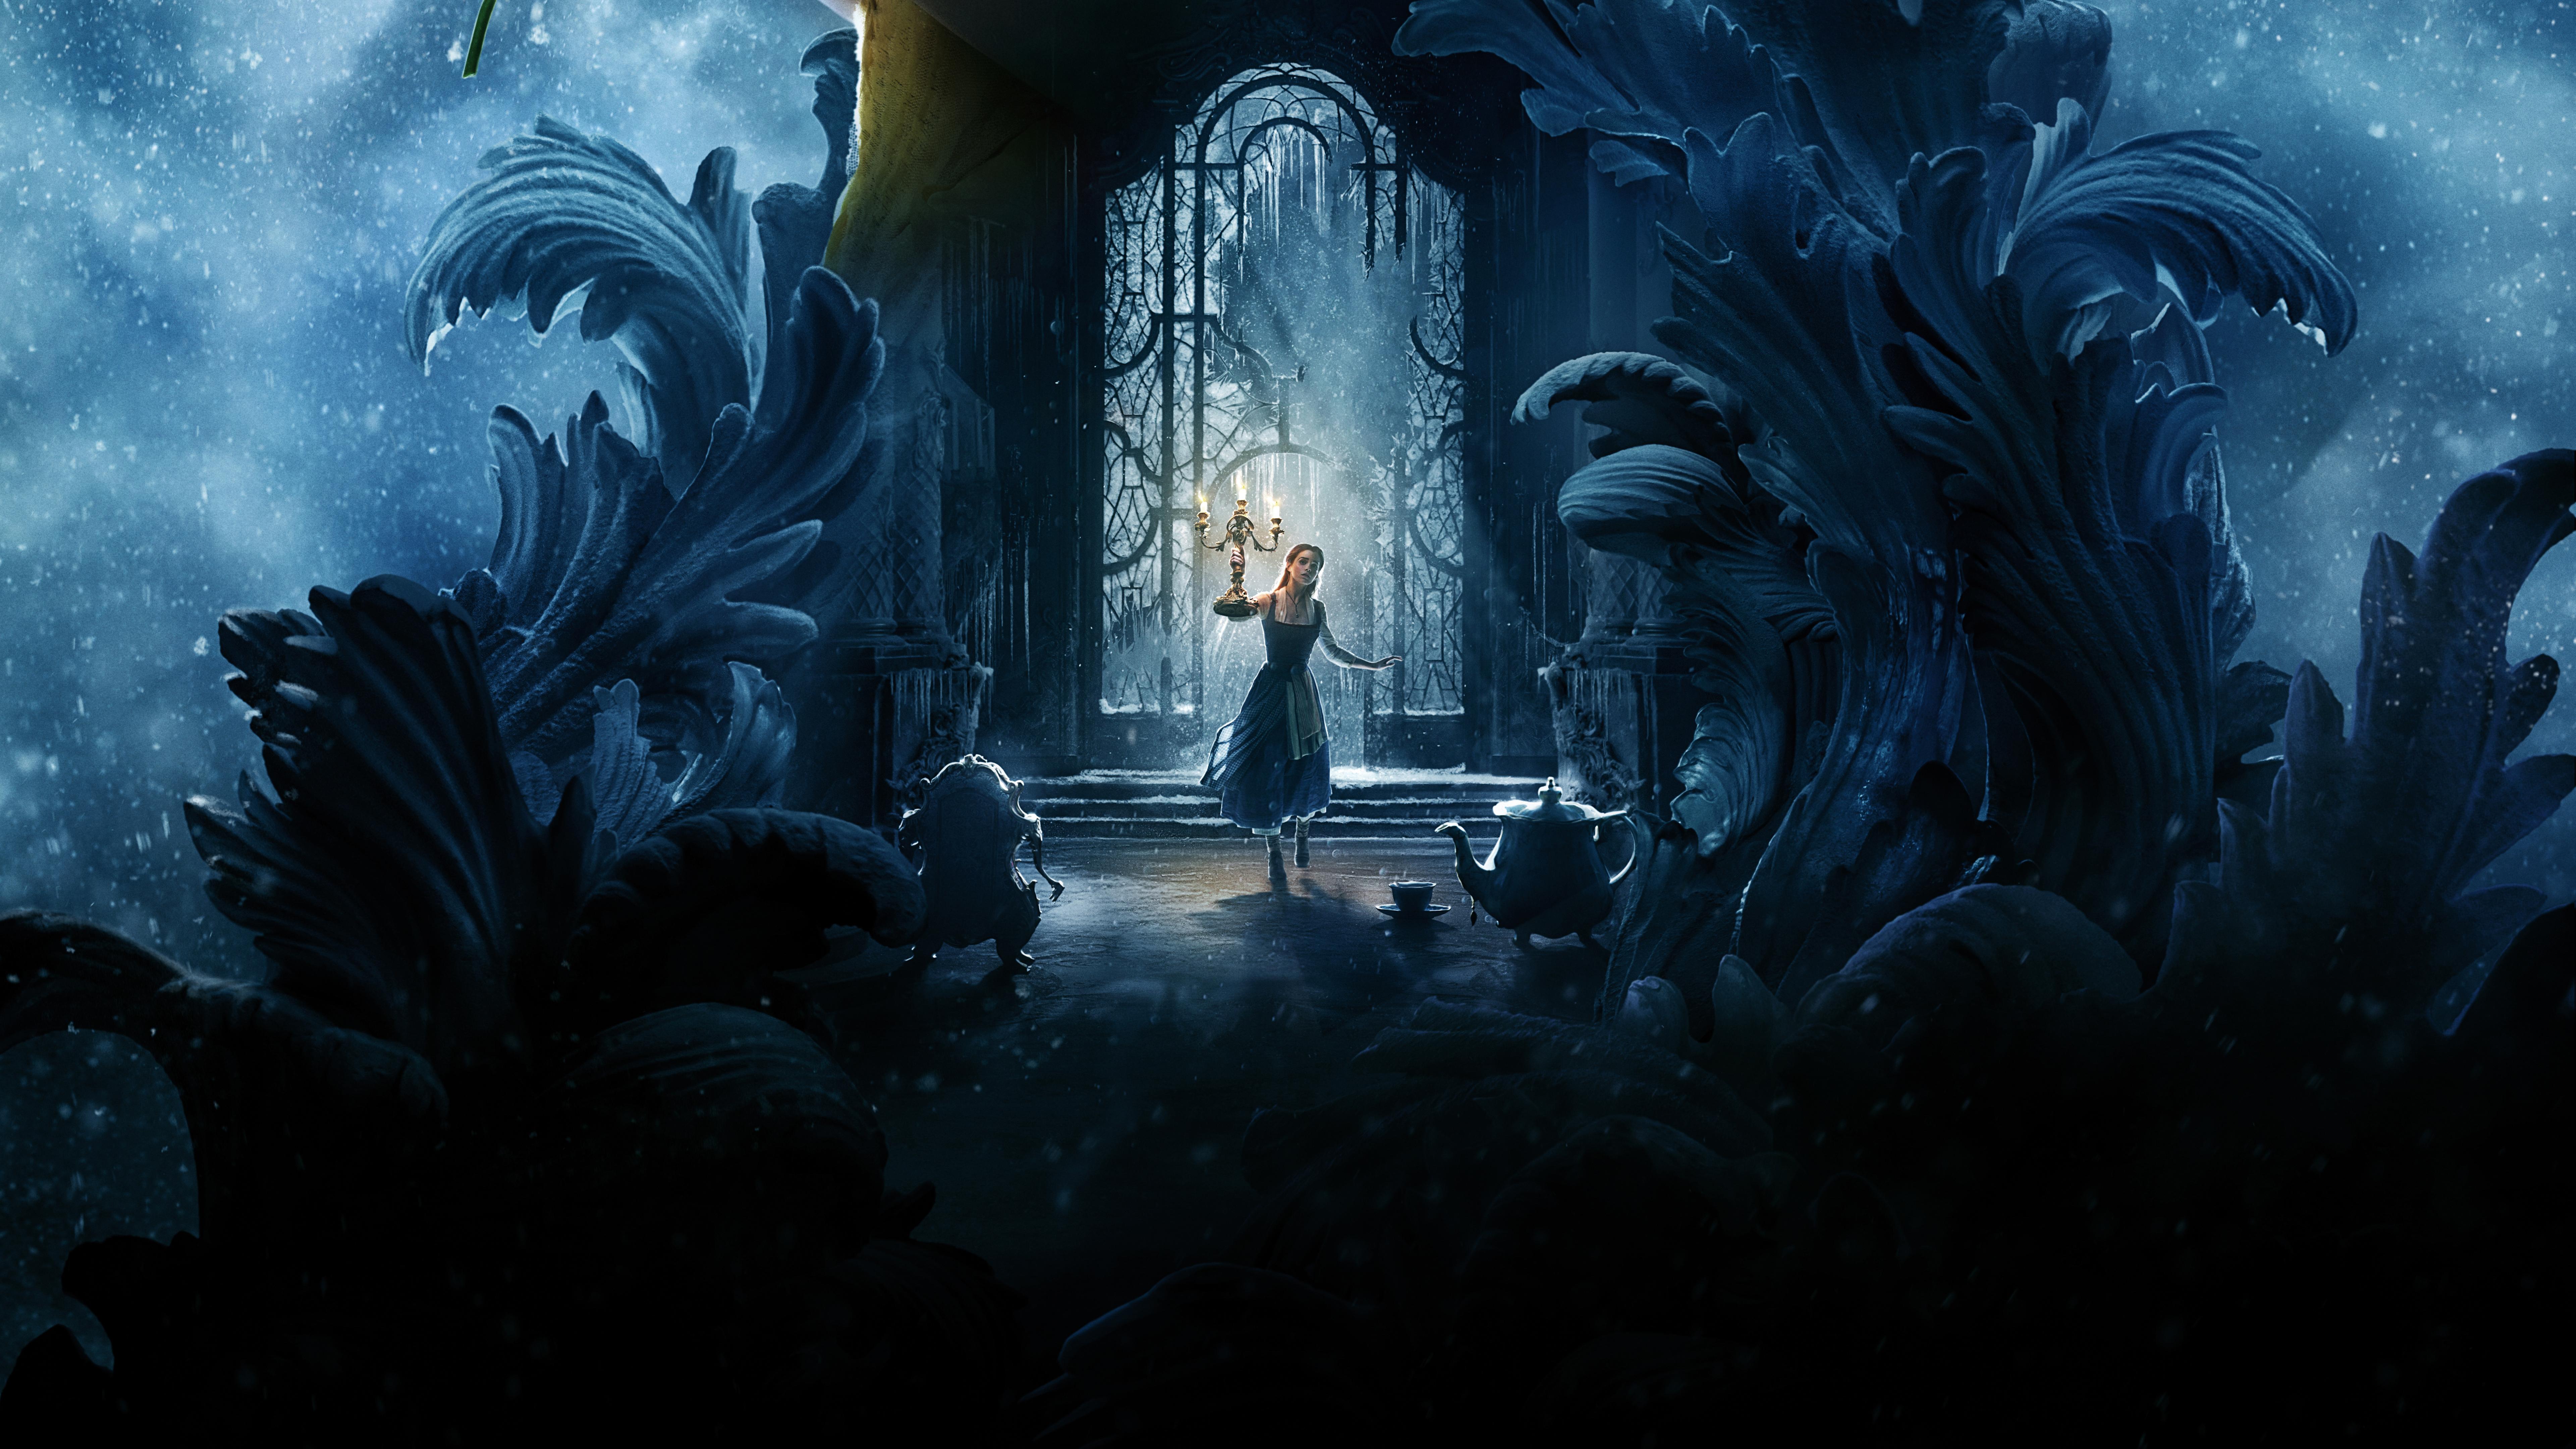 Beauty And The Beast Emma Watson 8k, HD Movies, 4k ...